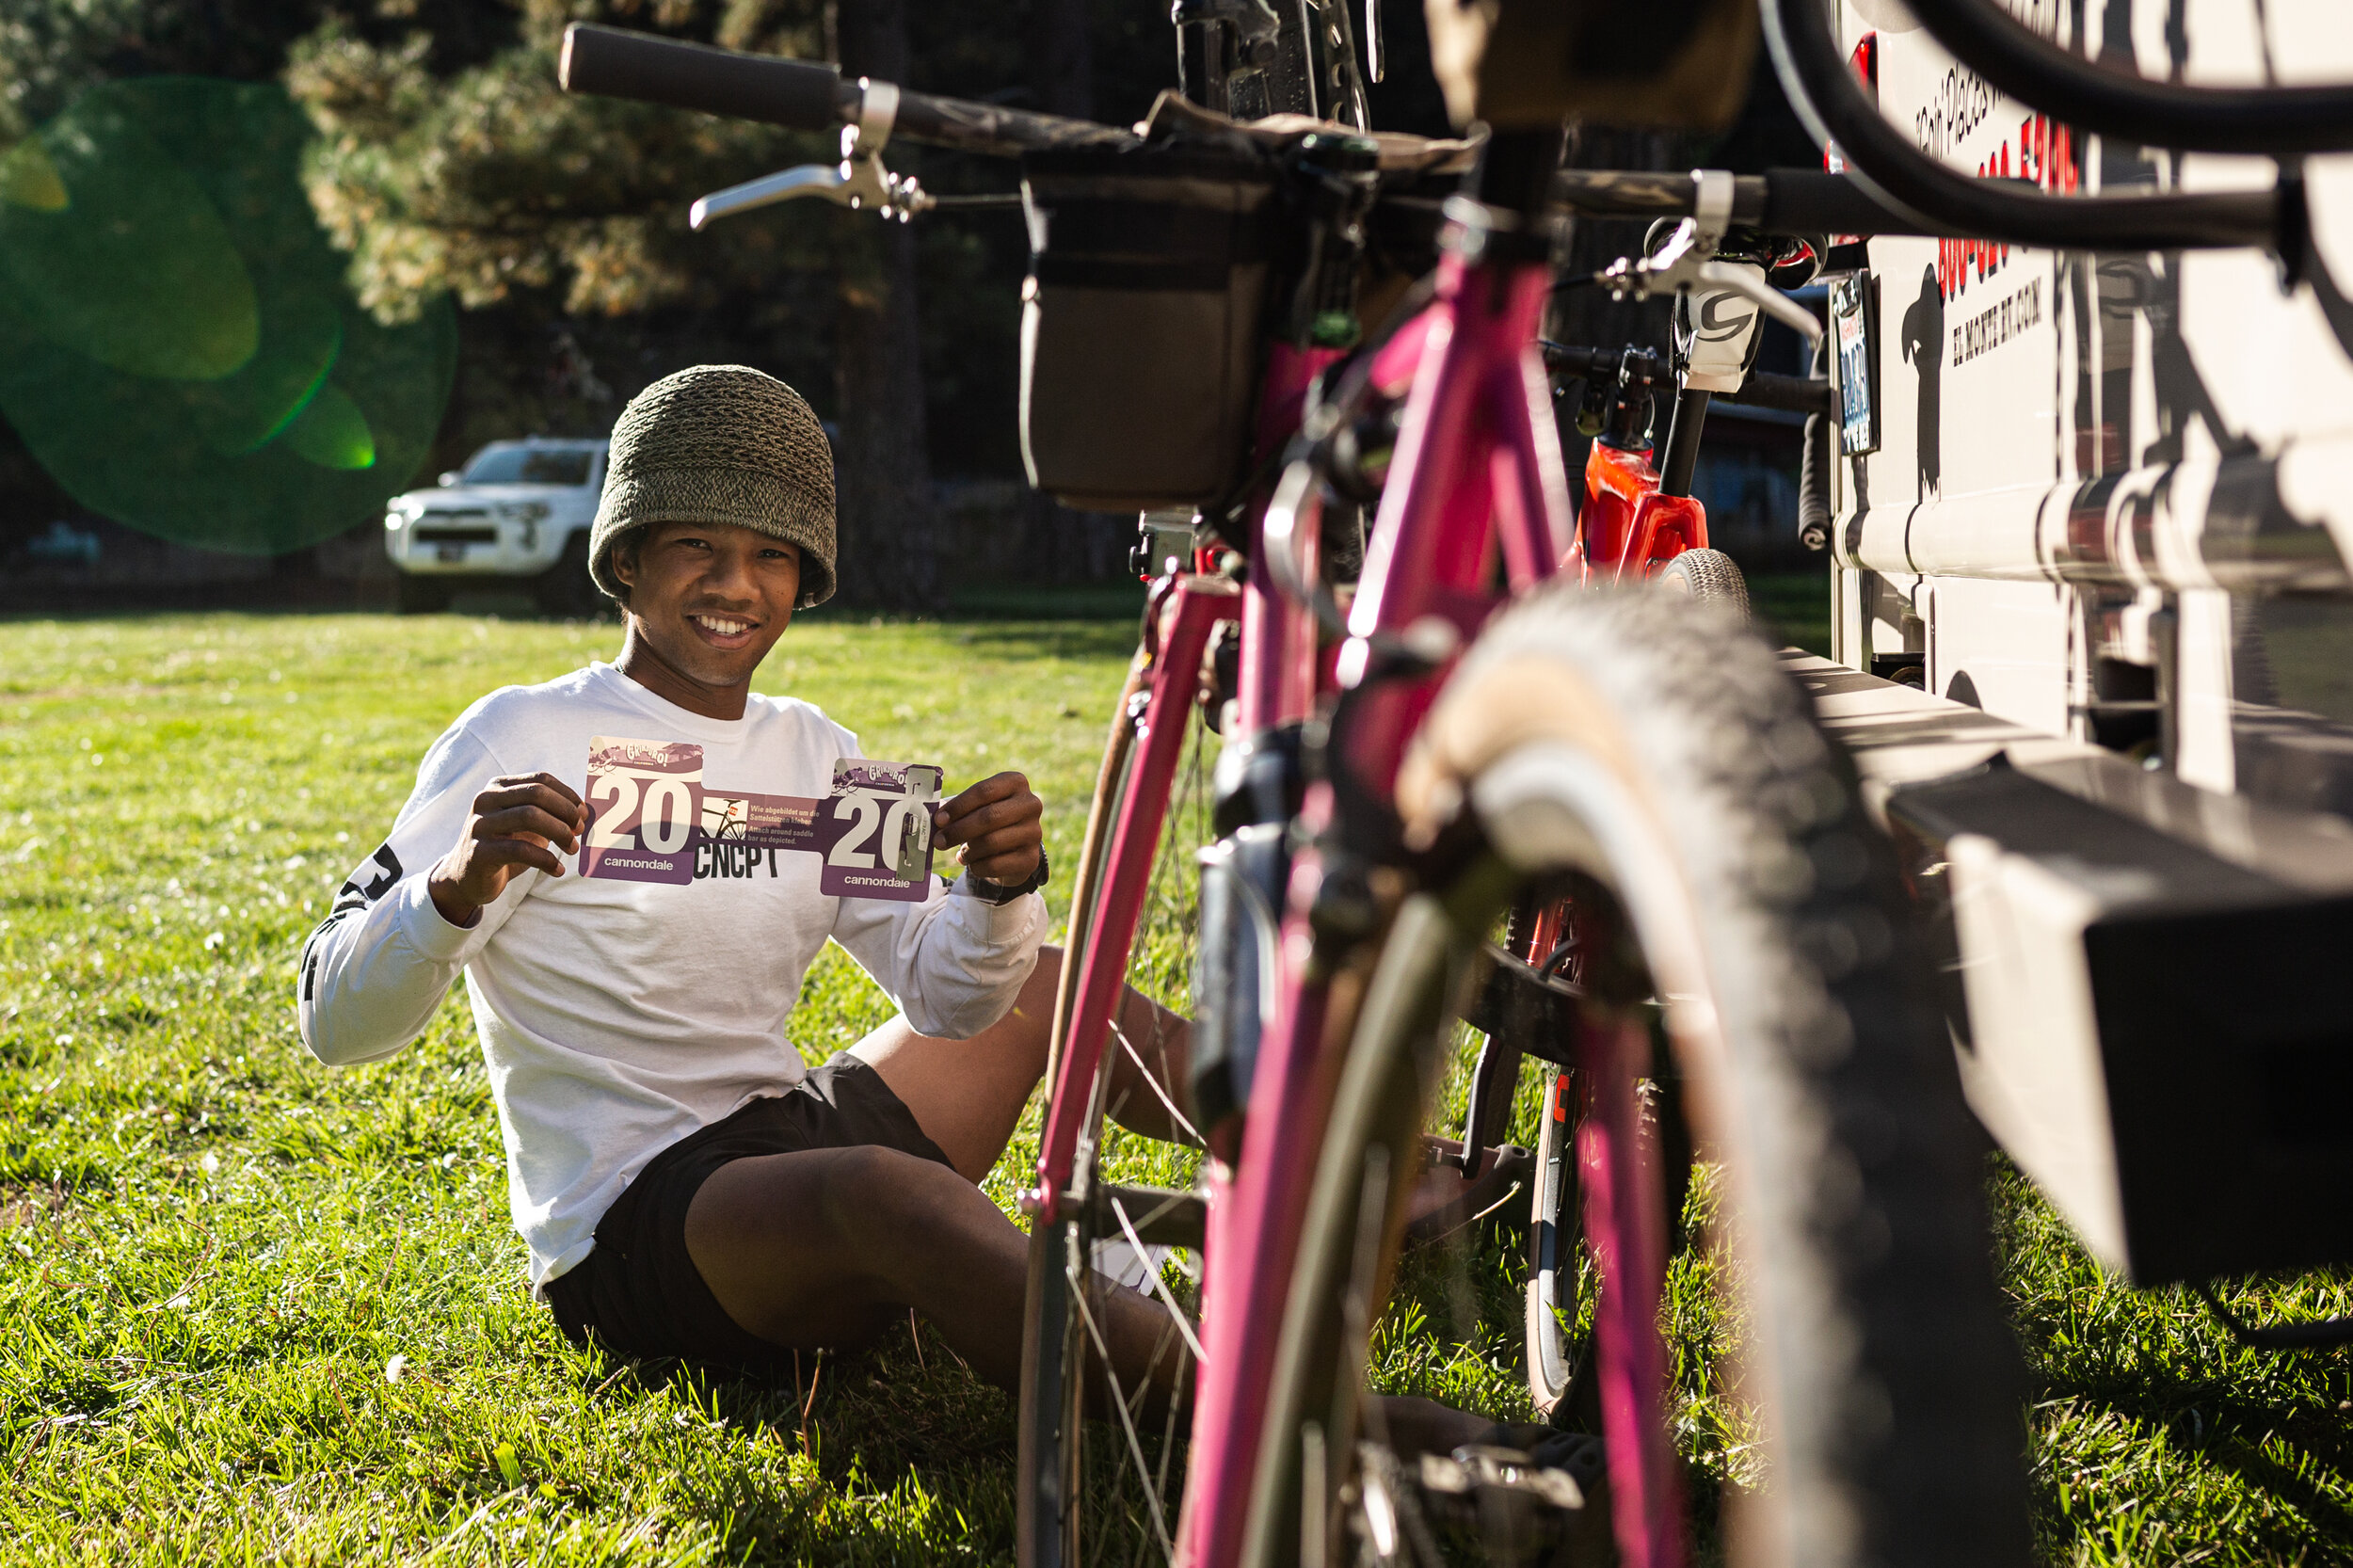 Bike Racers California LA Team CNCPT